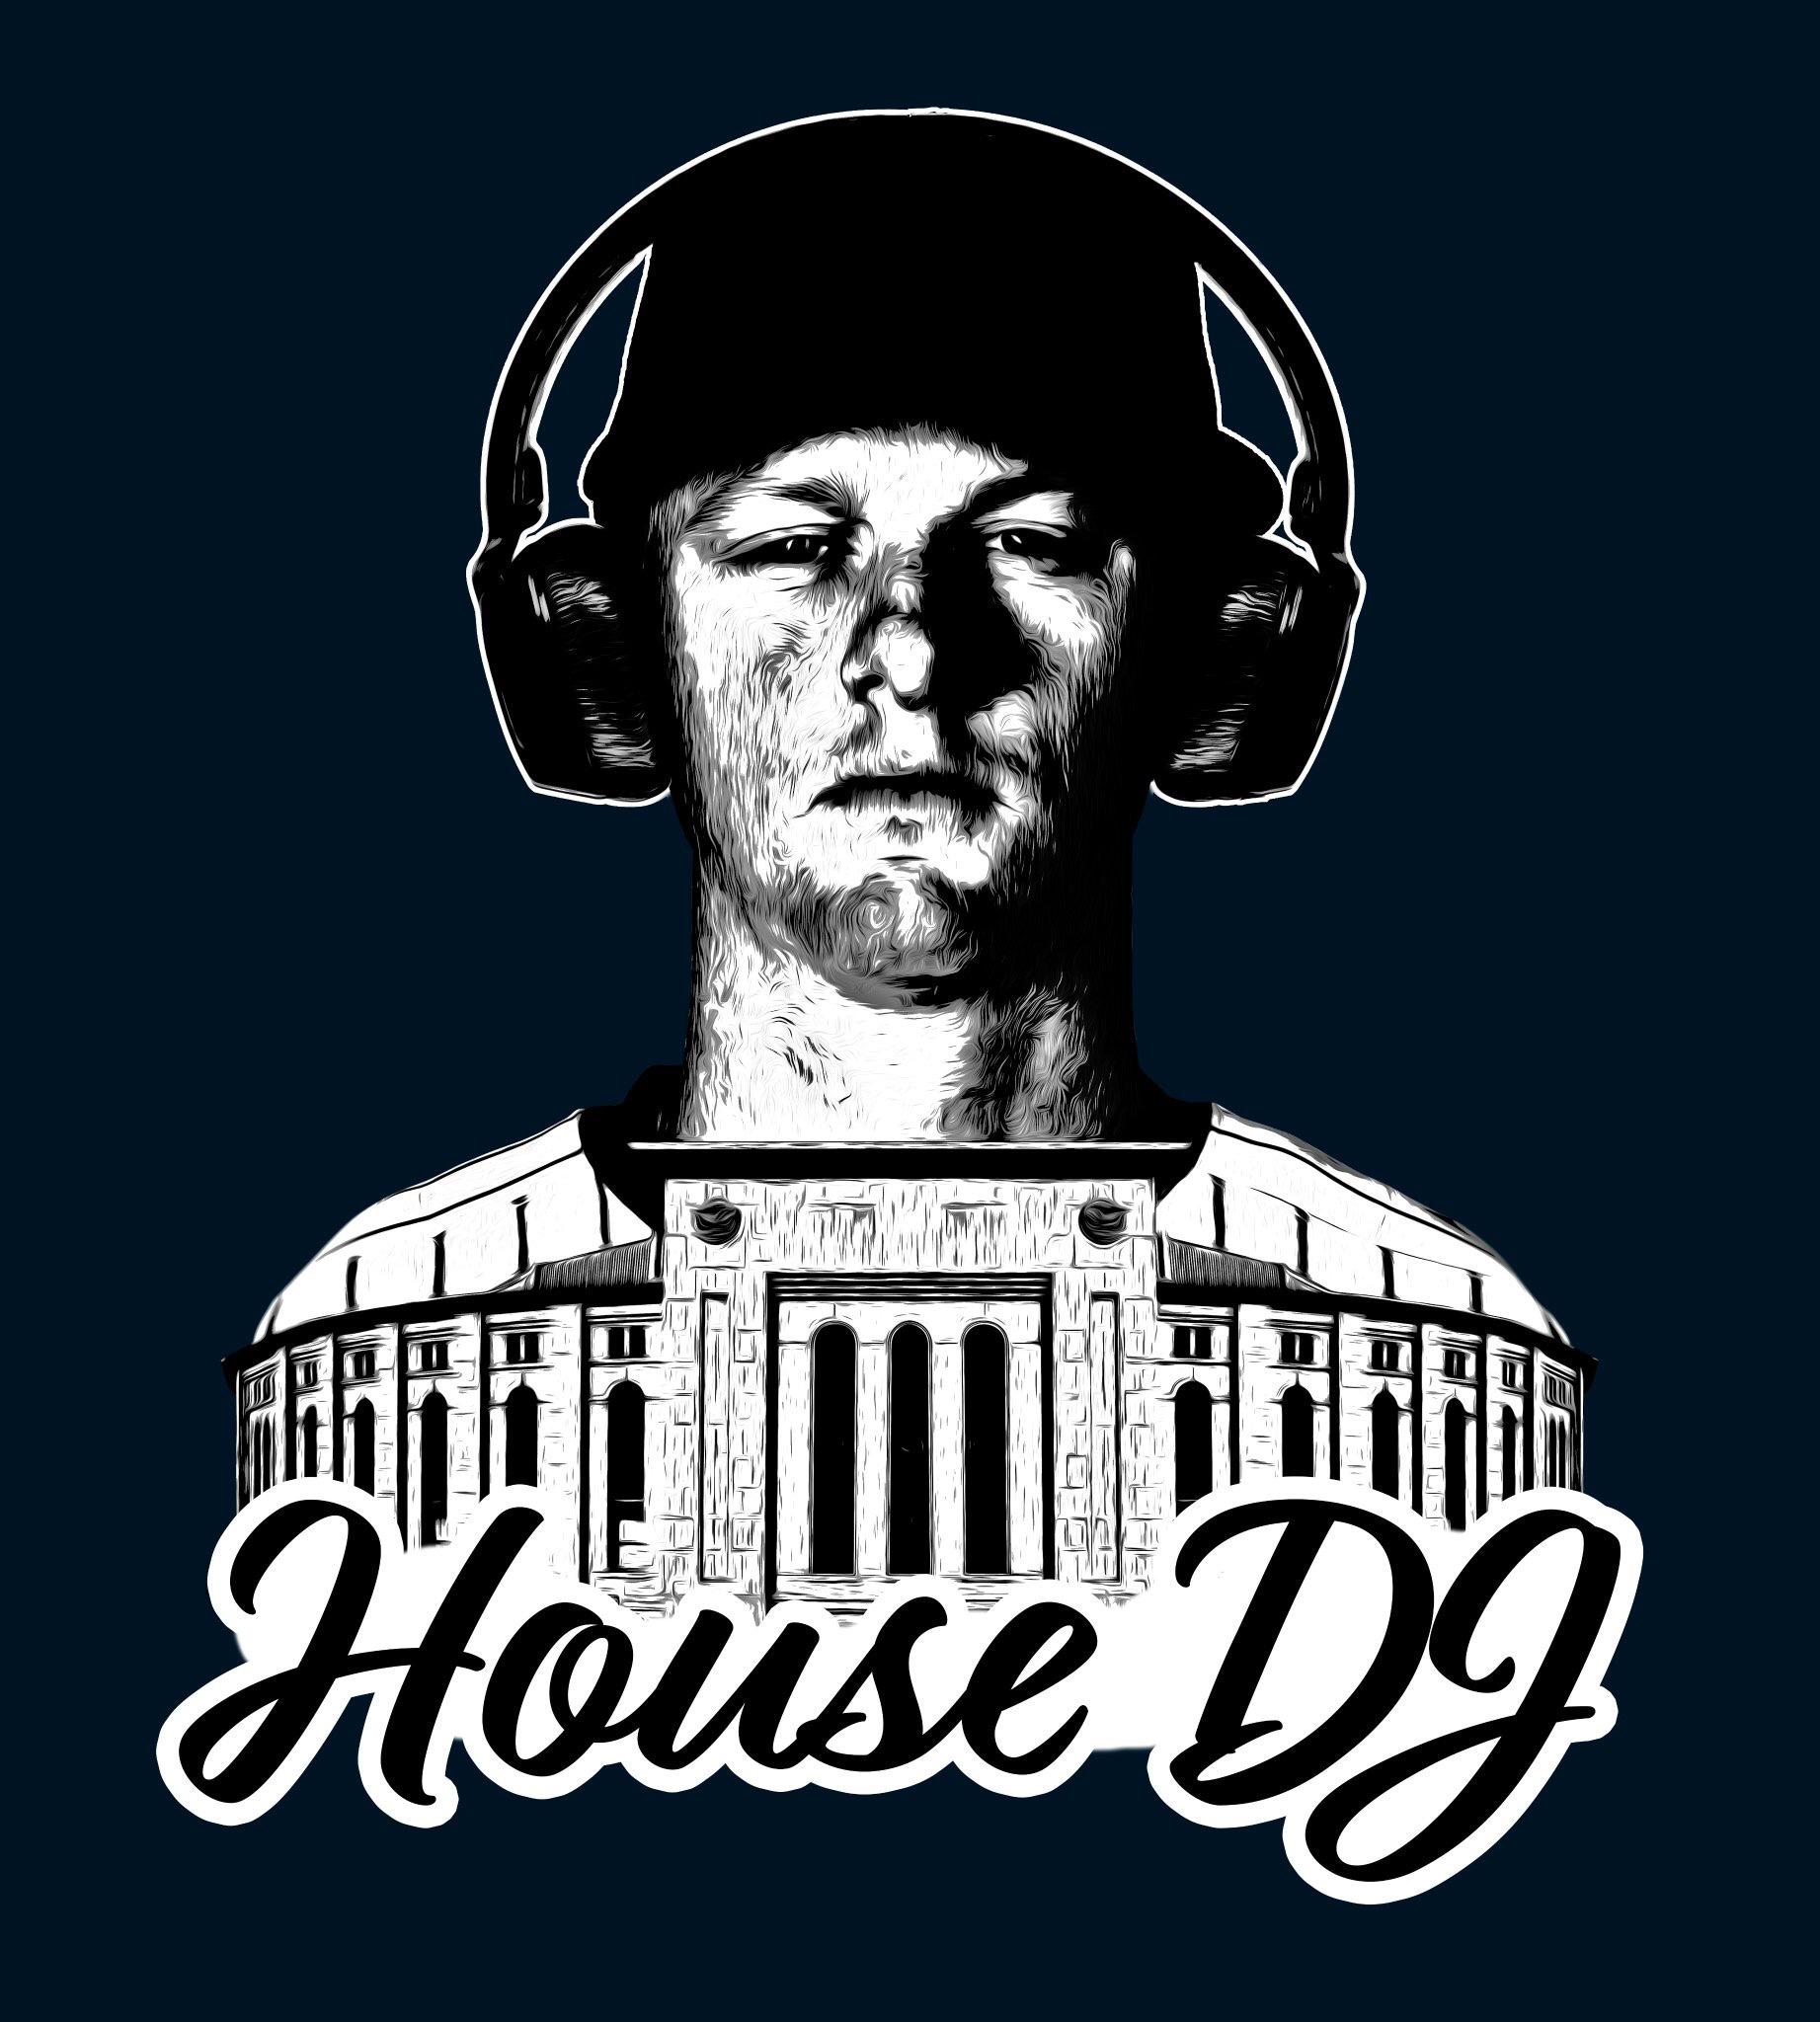 HOUSE DJ SHIRTS